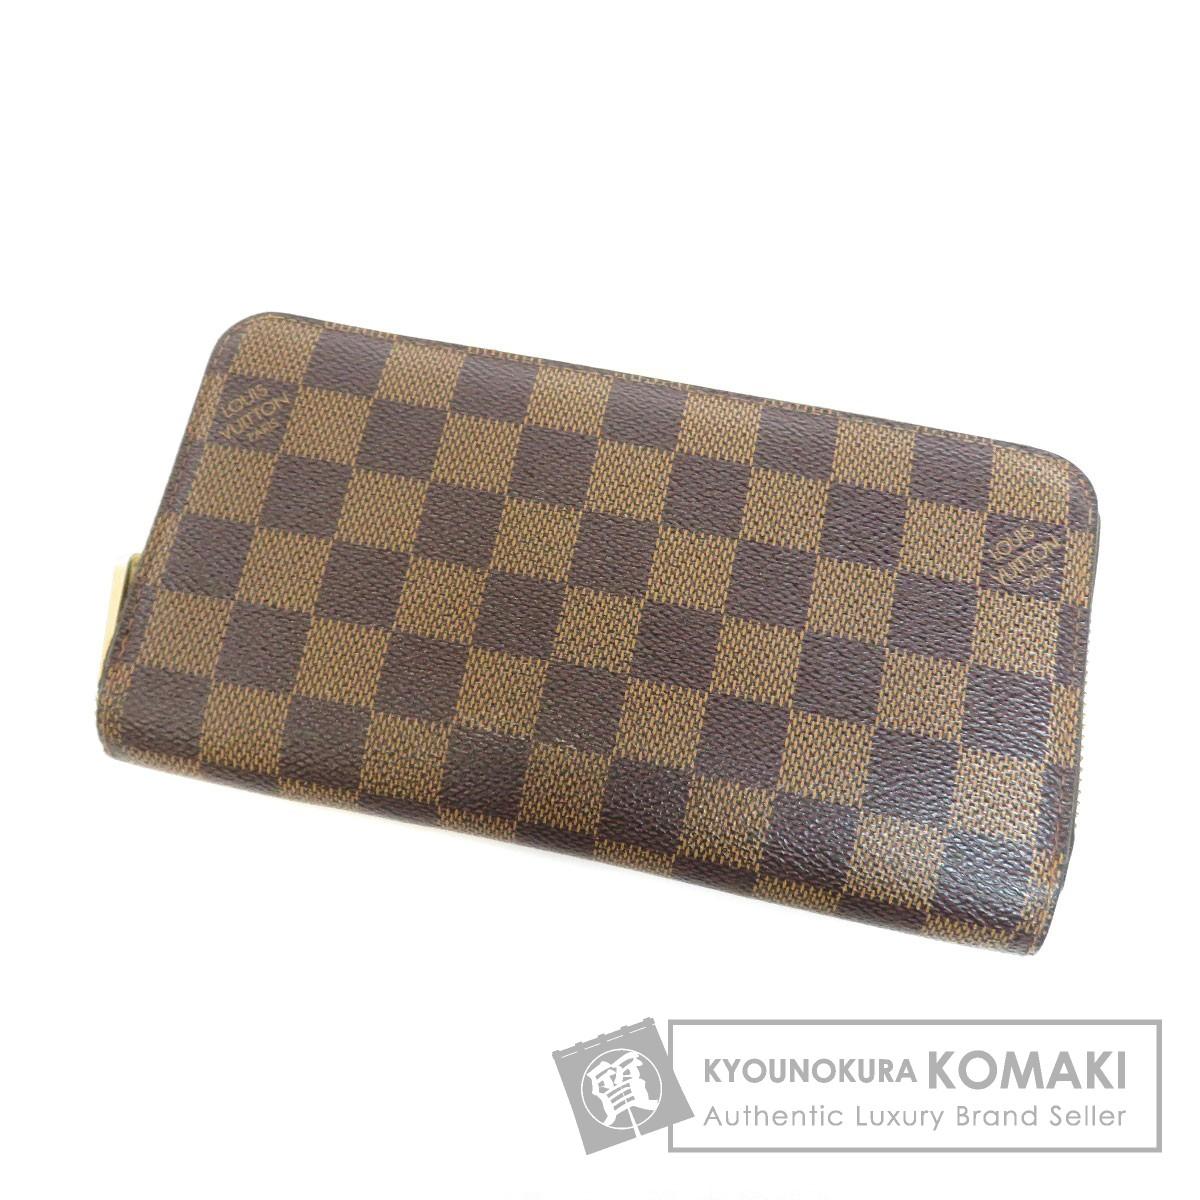 44c6021c6cc4 shop.r10s.jp/kyounokura/cabinet/item20181002/05918...